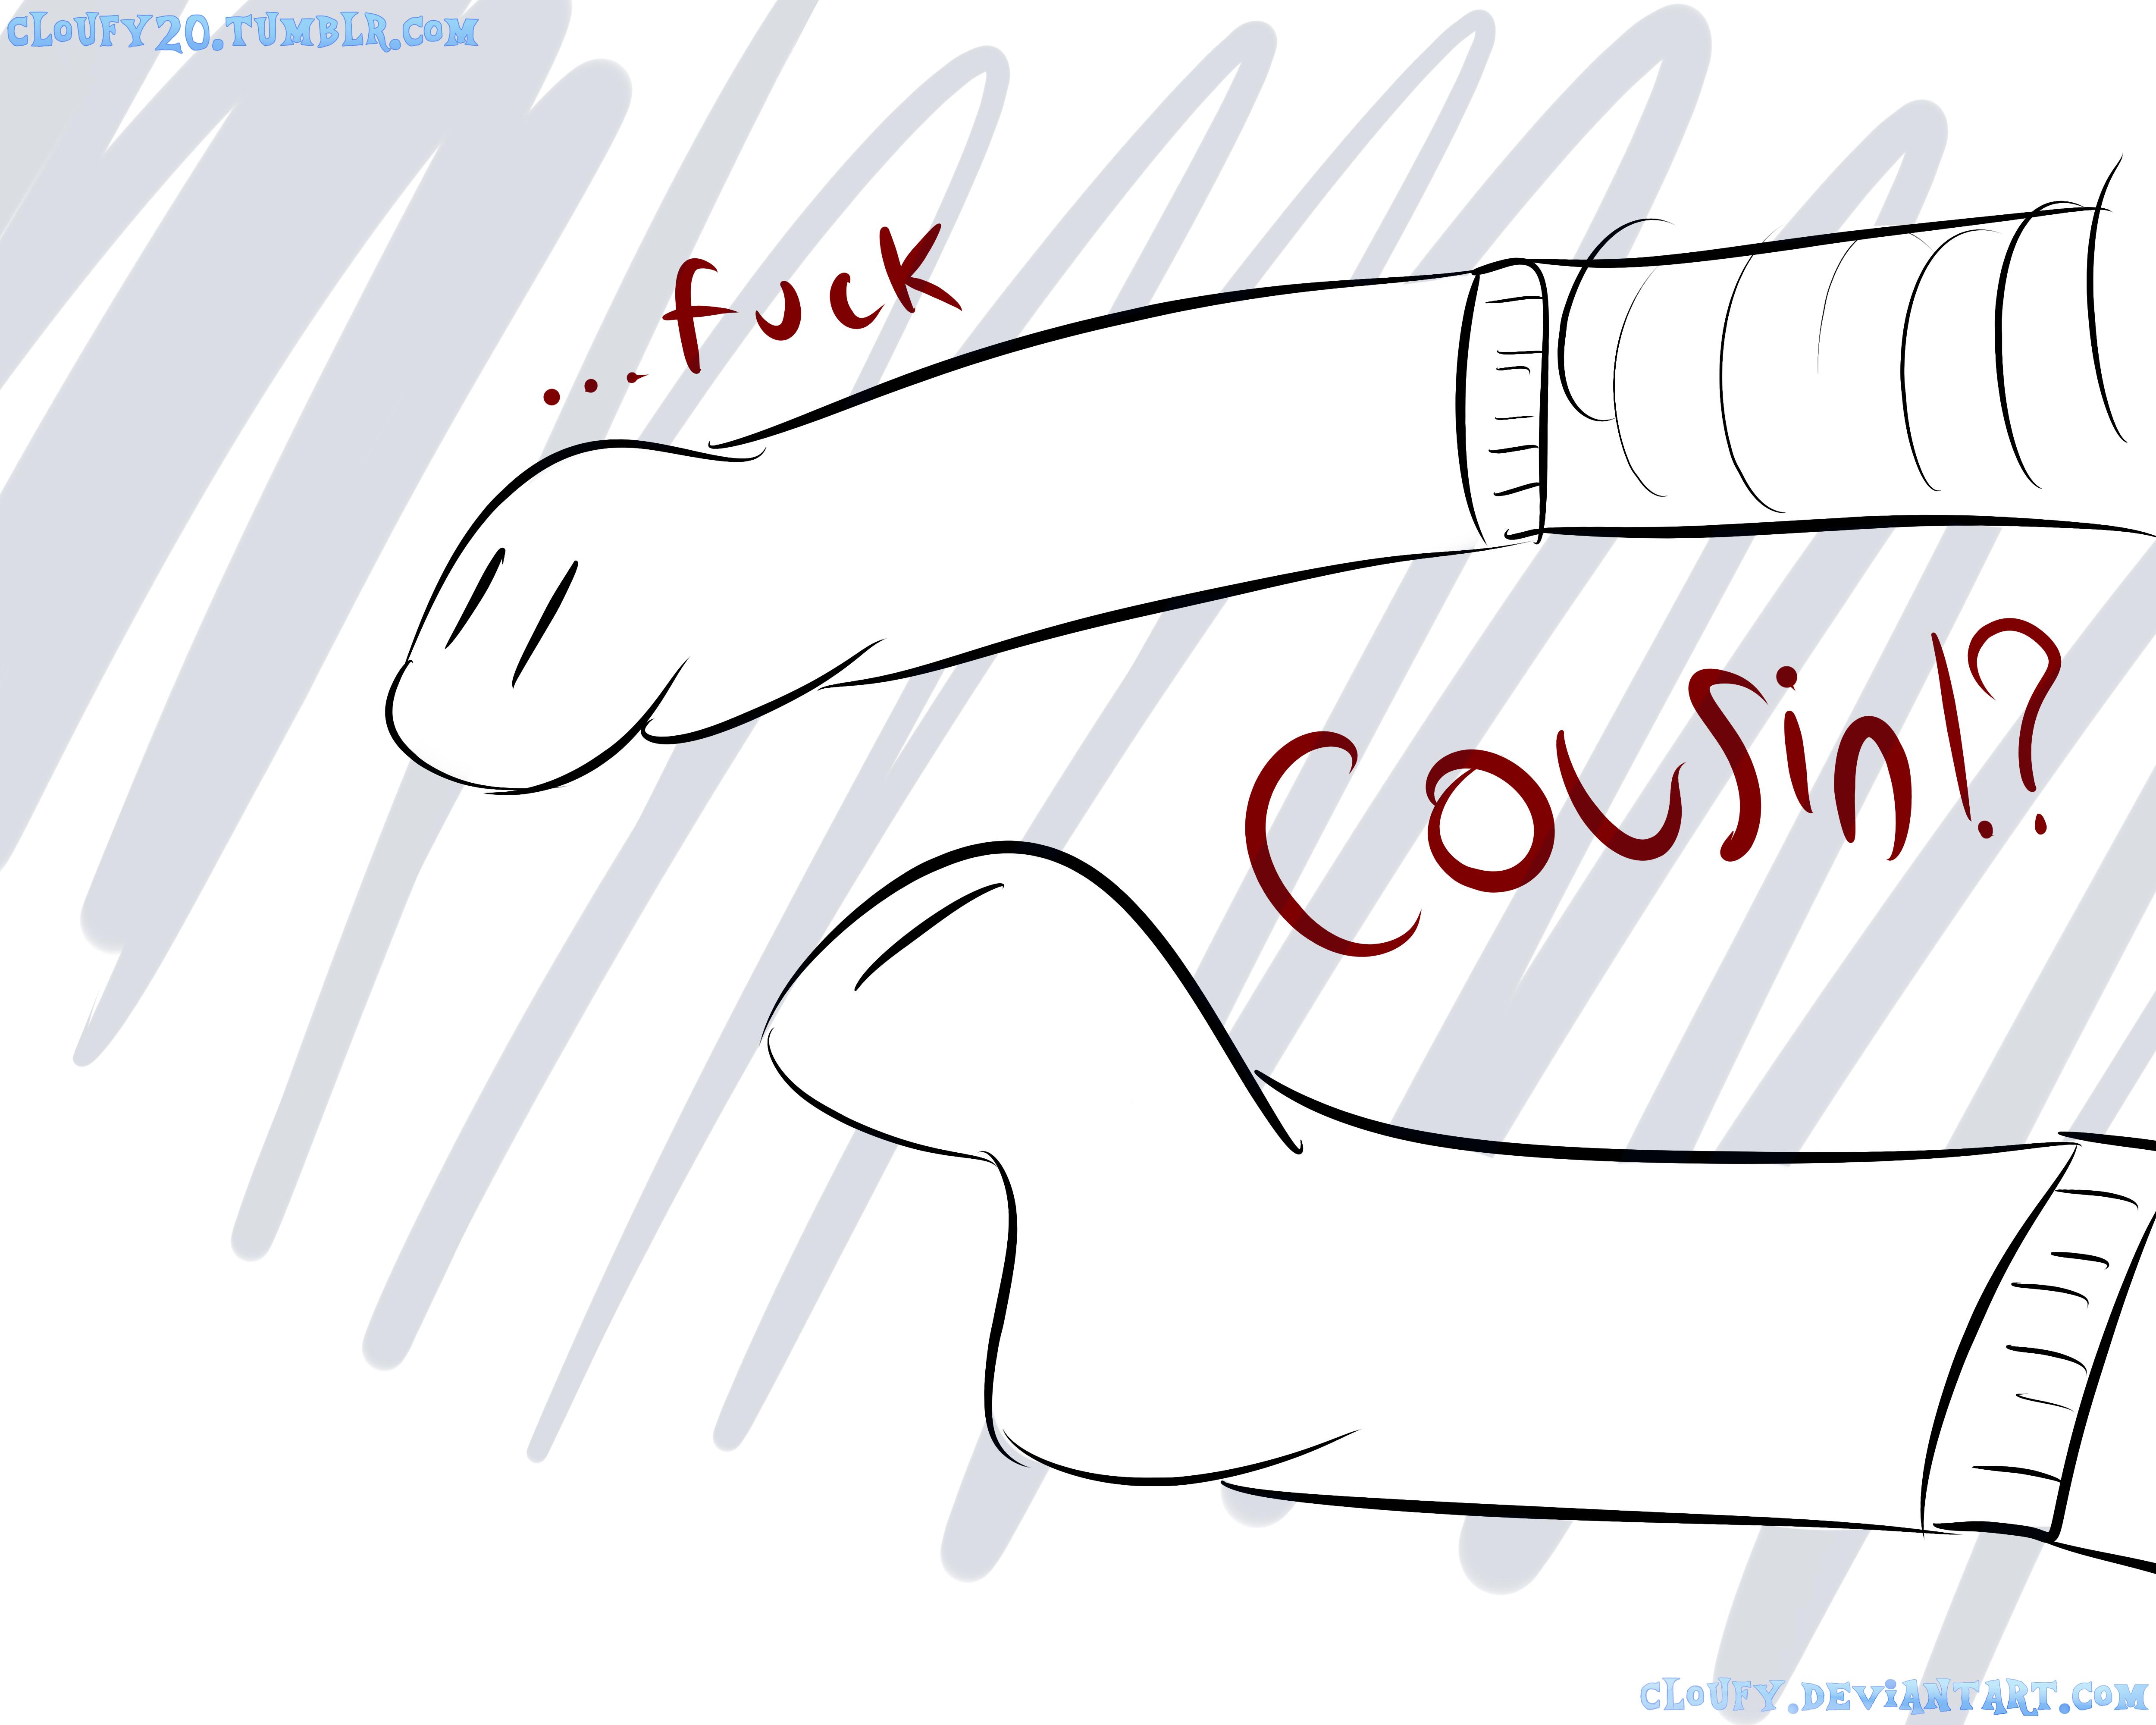 Sockies by Cloufy